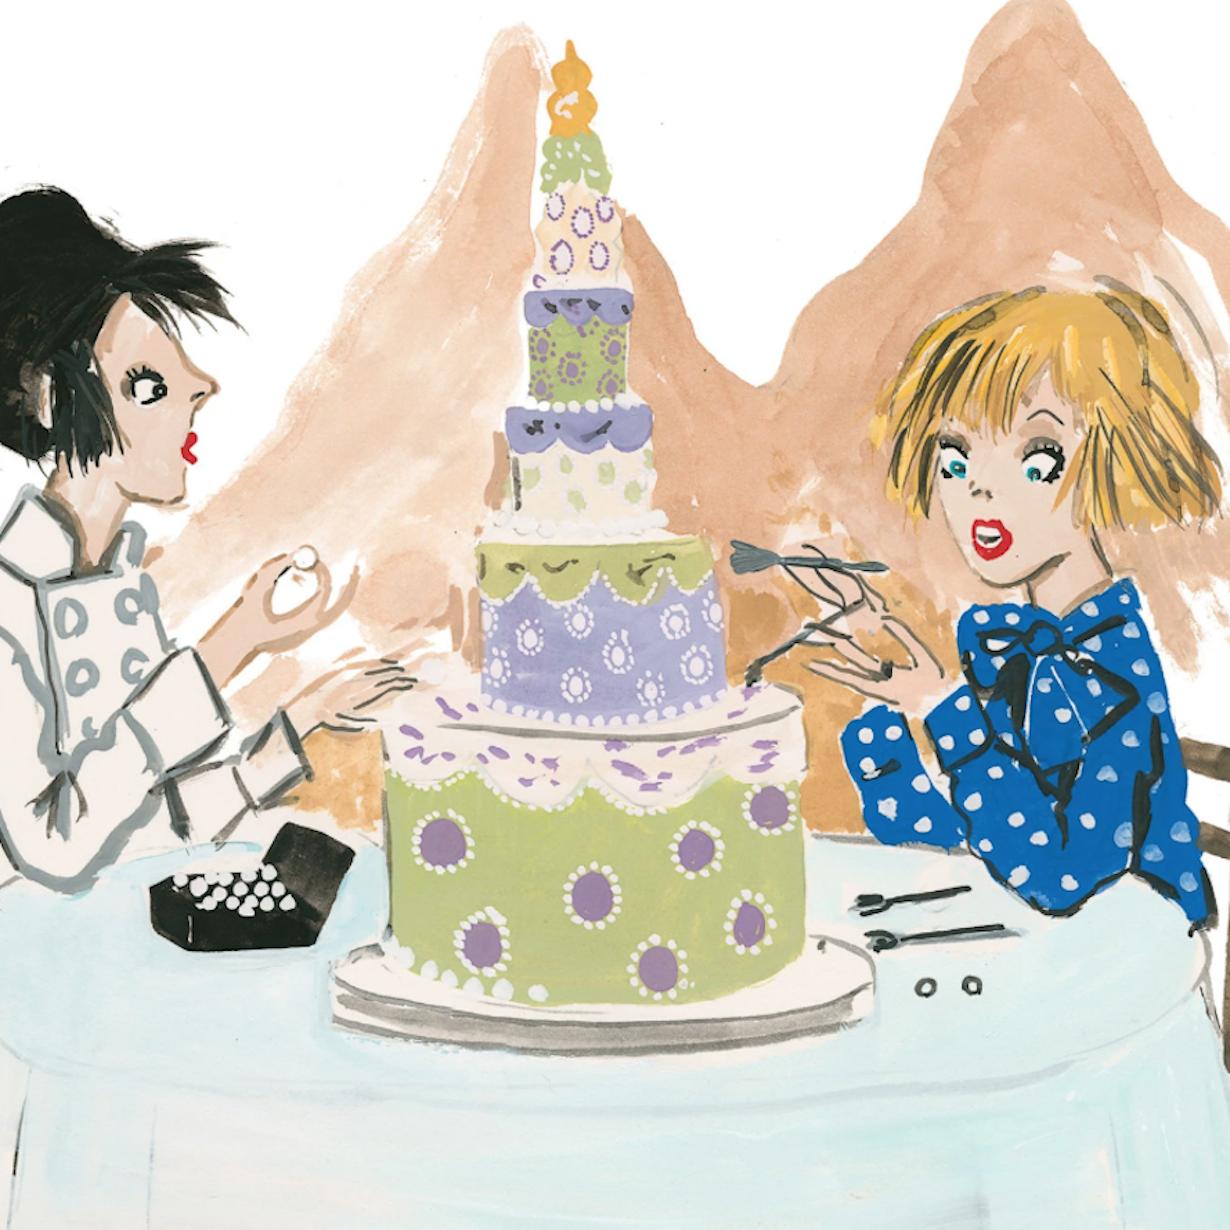 T MAGAZINE - A Sugar Artist Leads a Cake Walk Through Central Italy